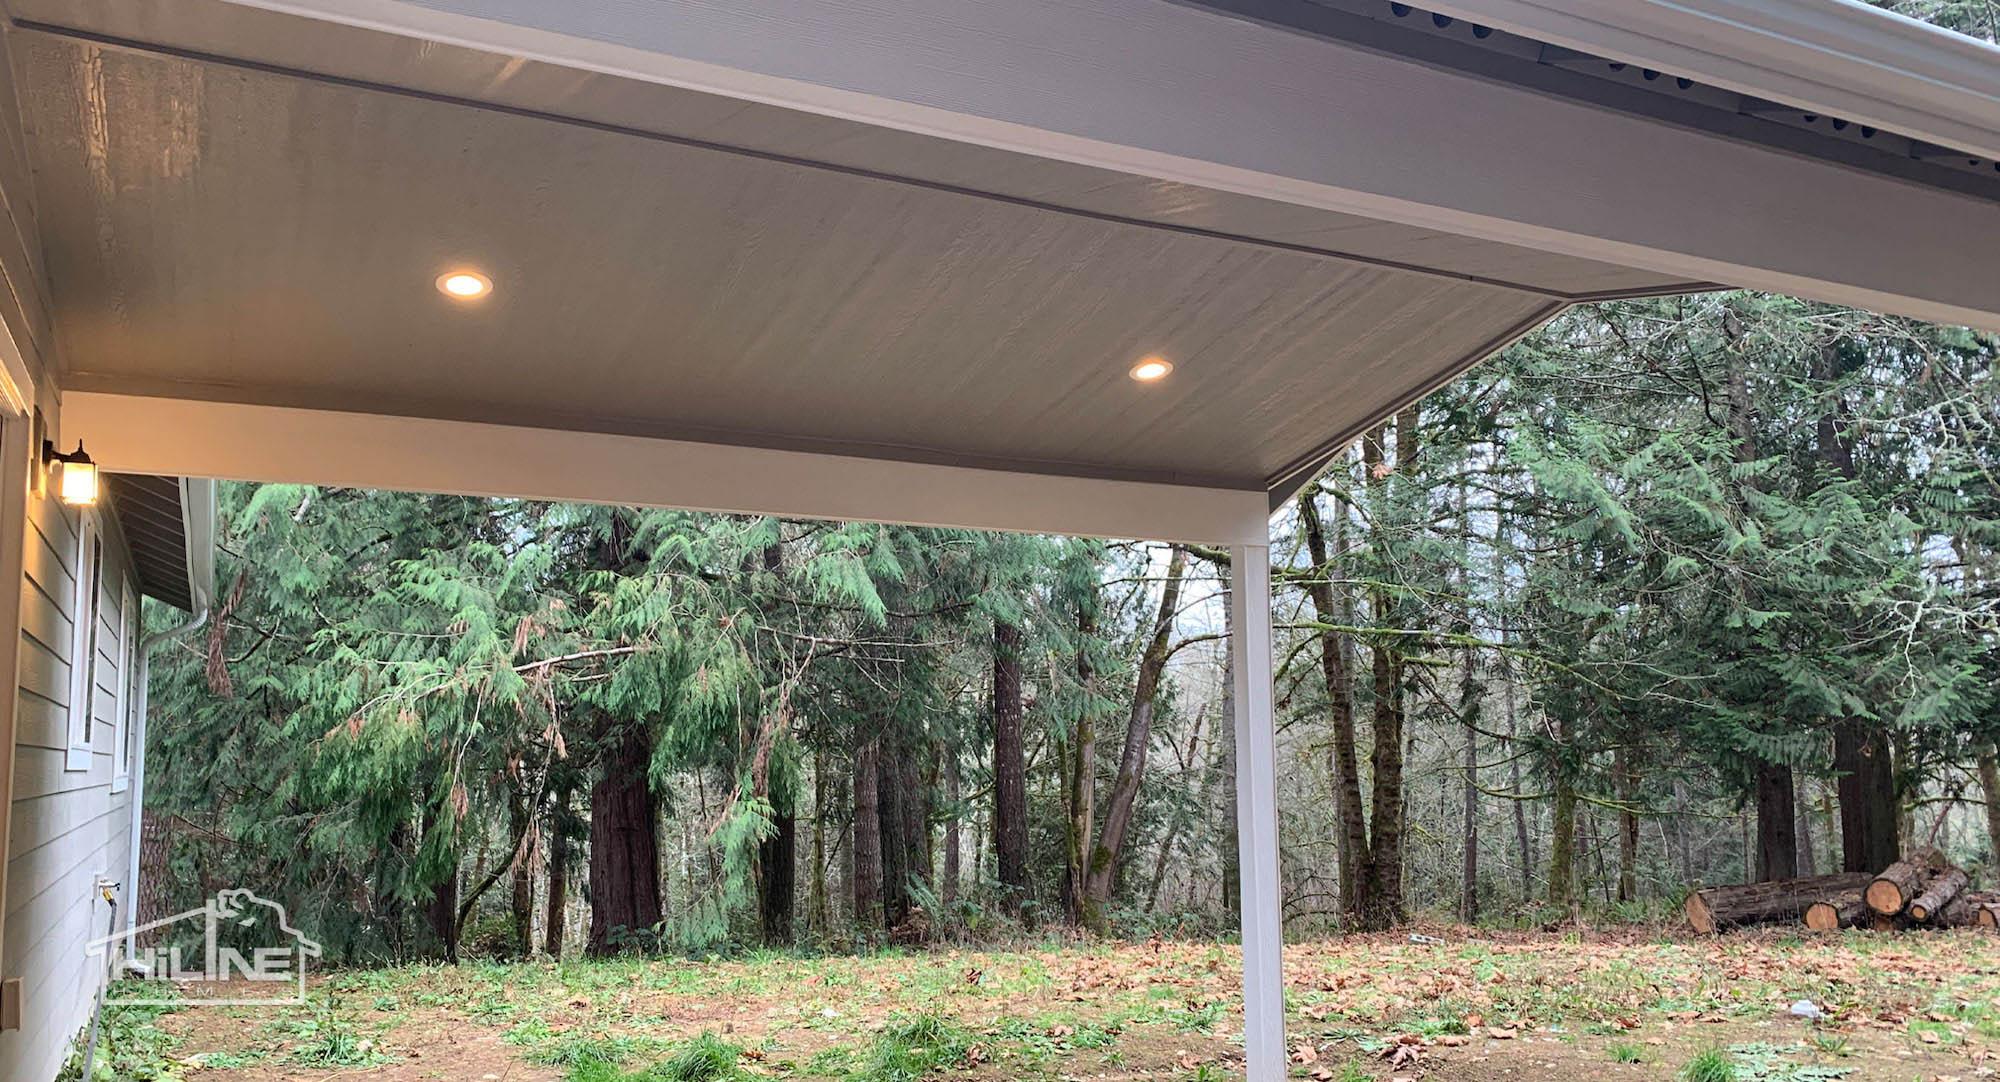 HiLine Home Plan 1491 Rear Exterior